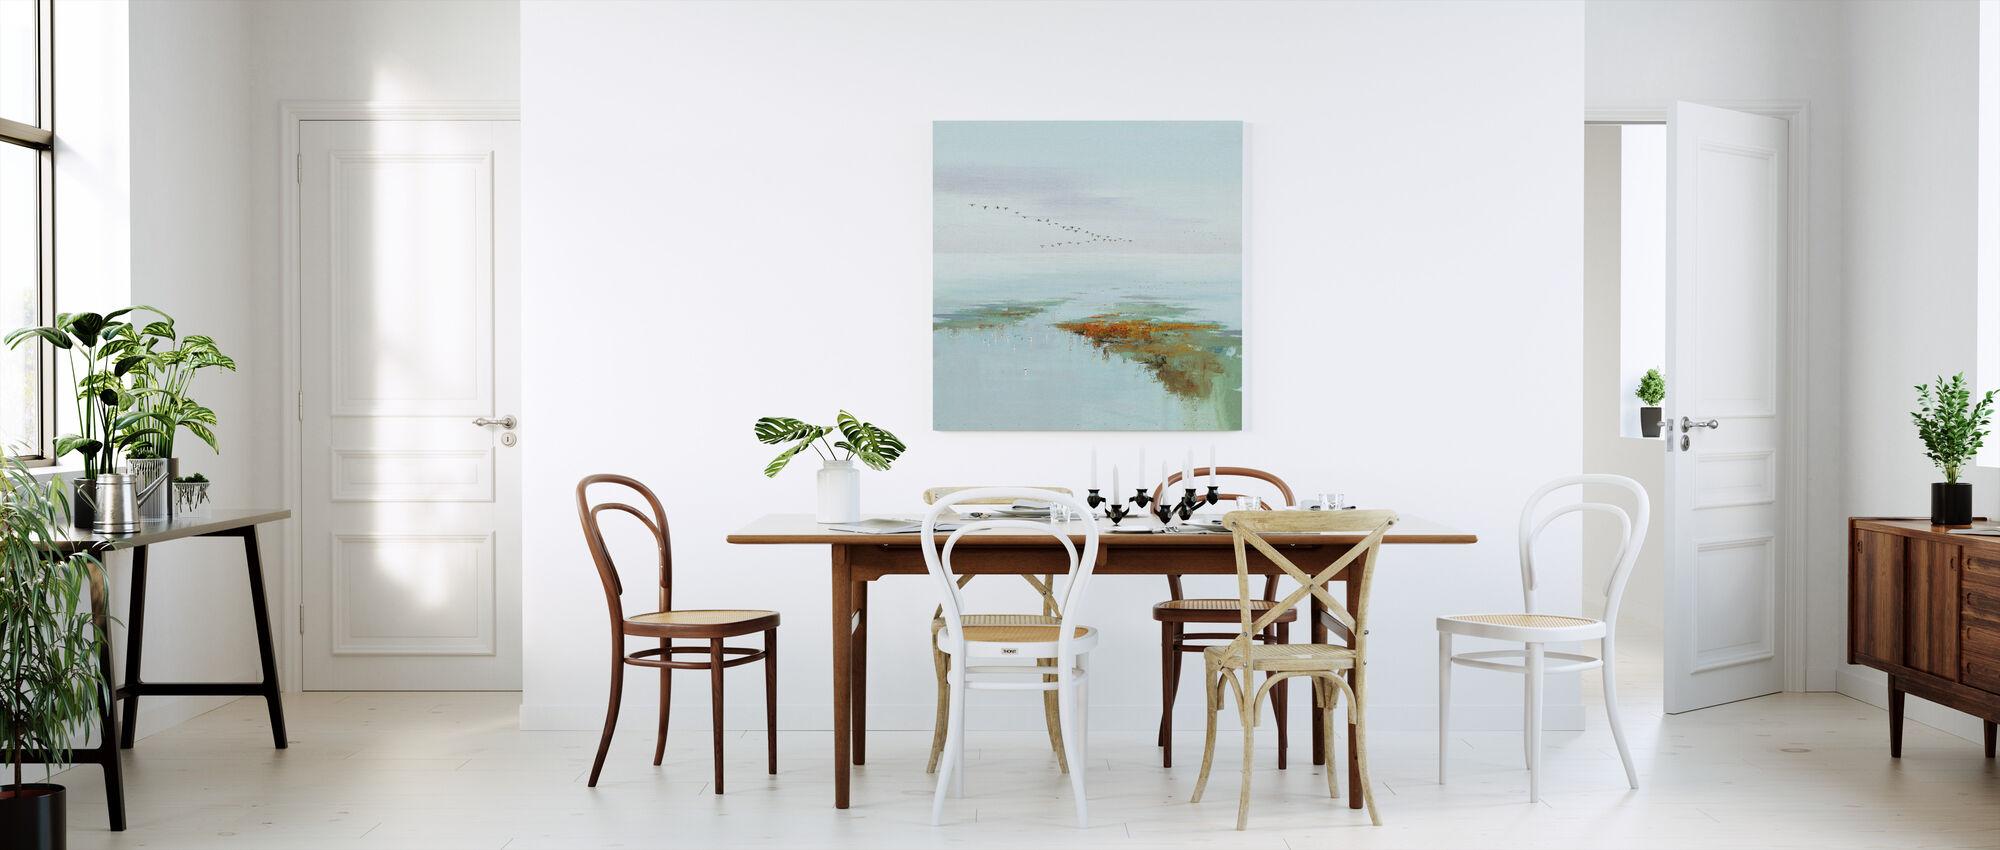 Vliegende vogels - Canvas print - Keuken